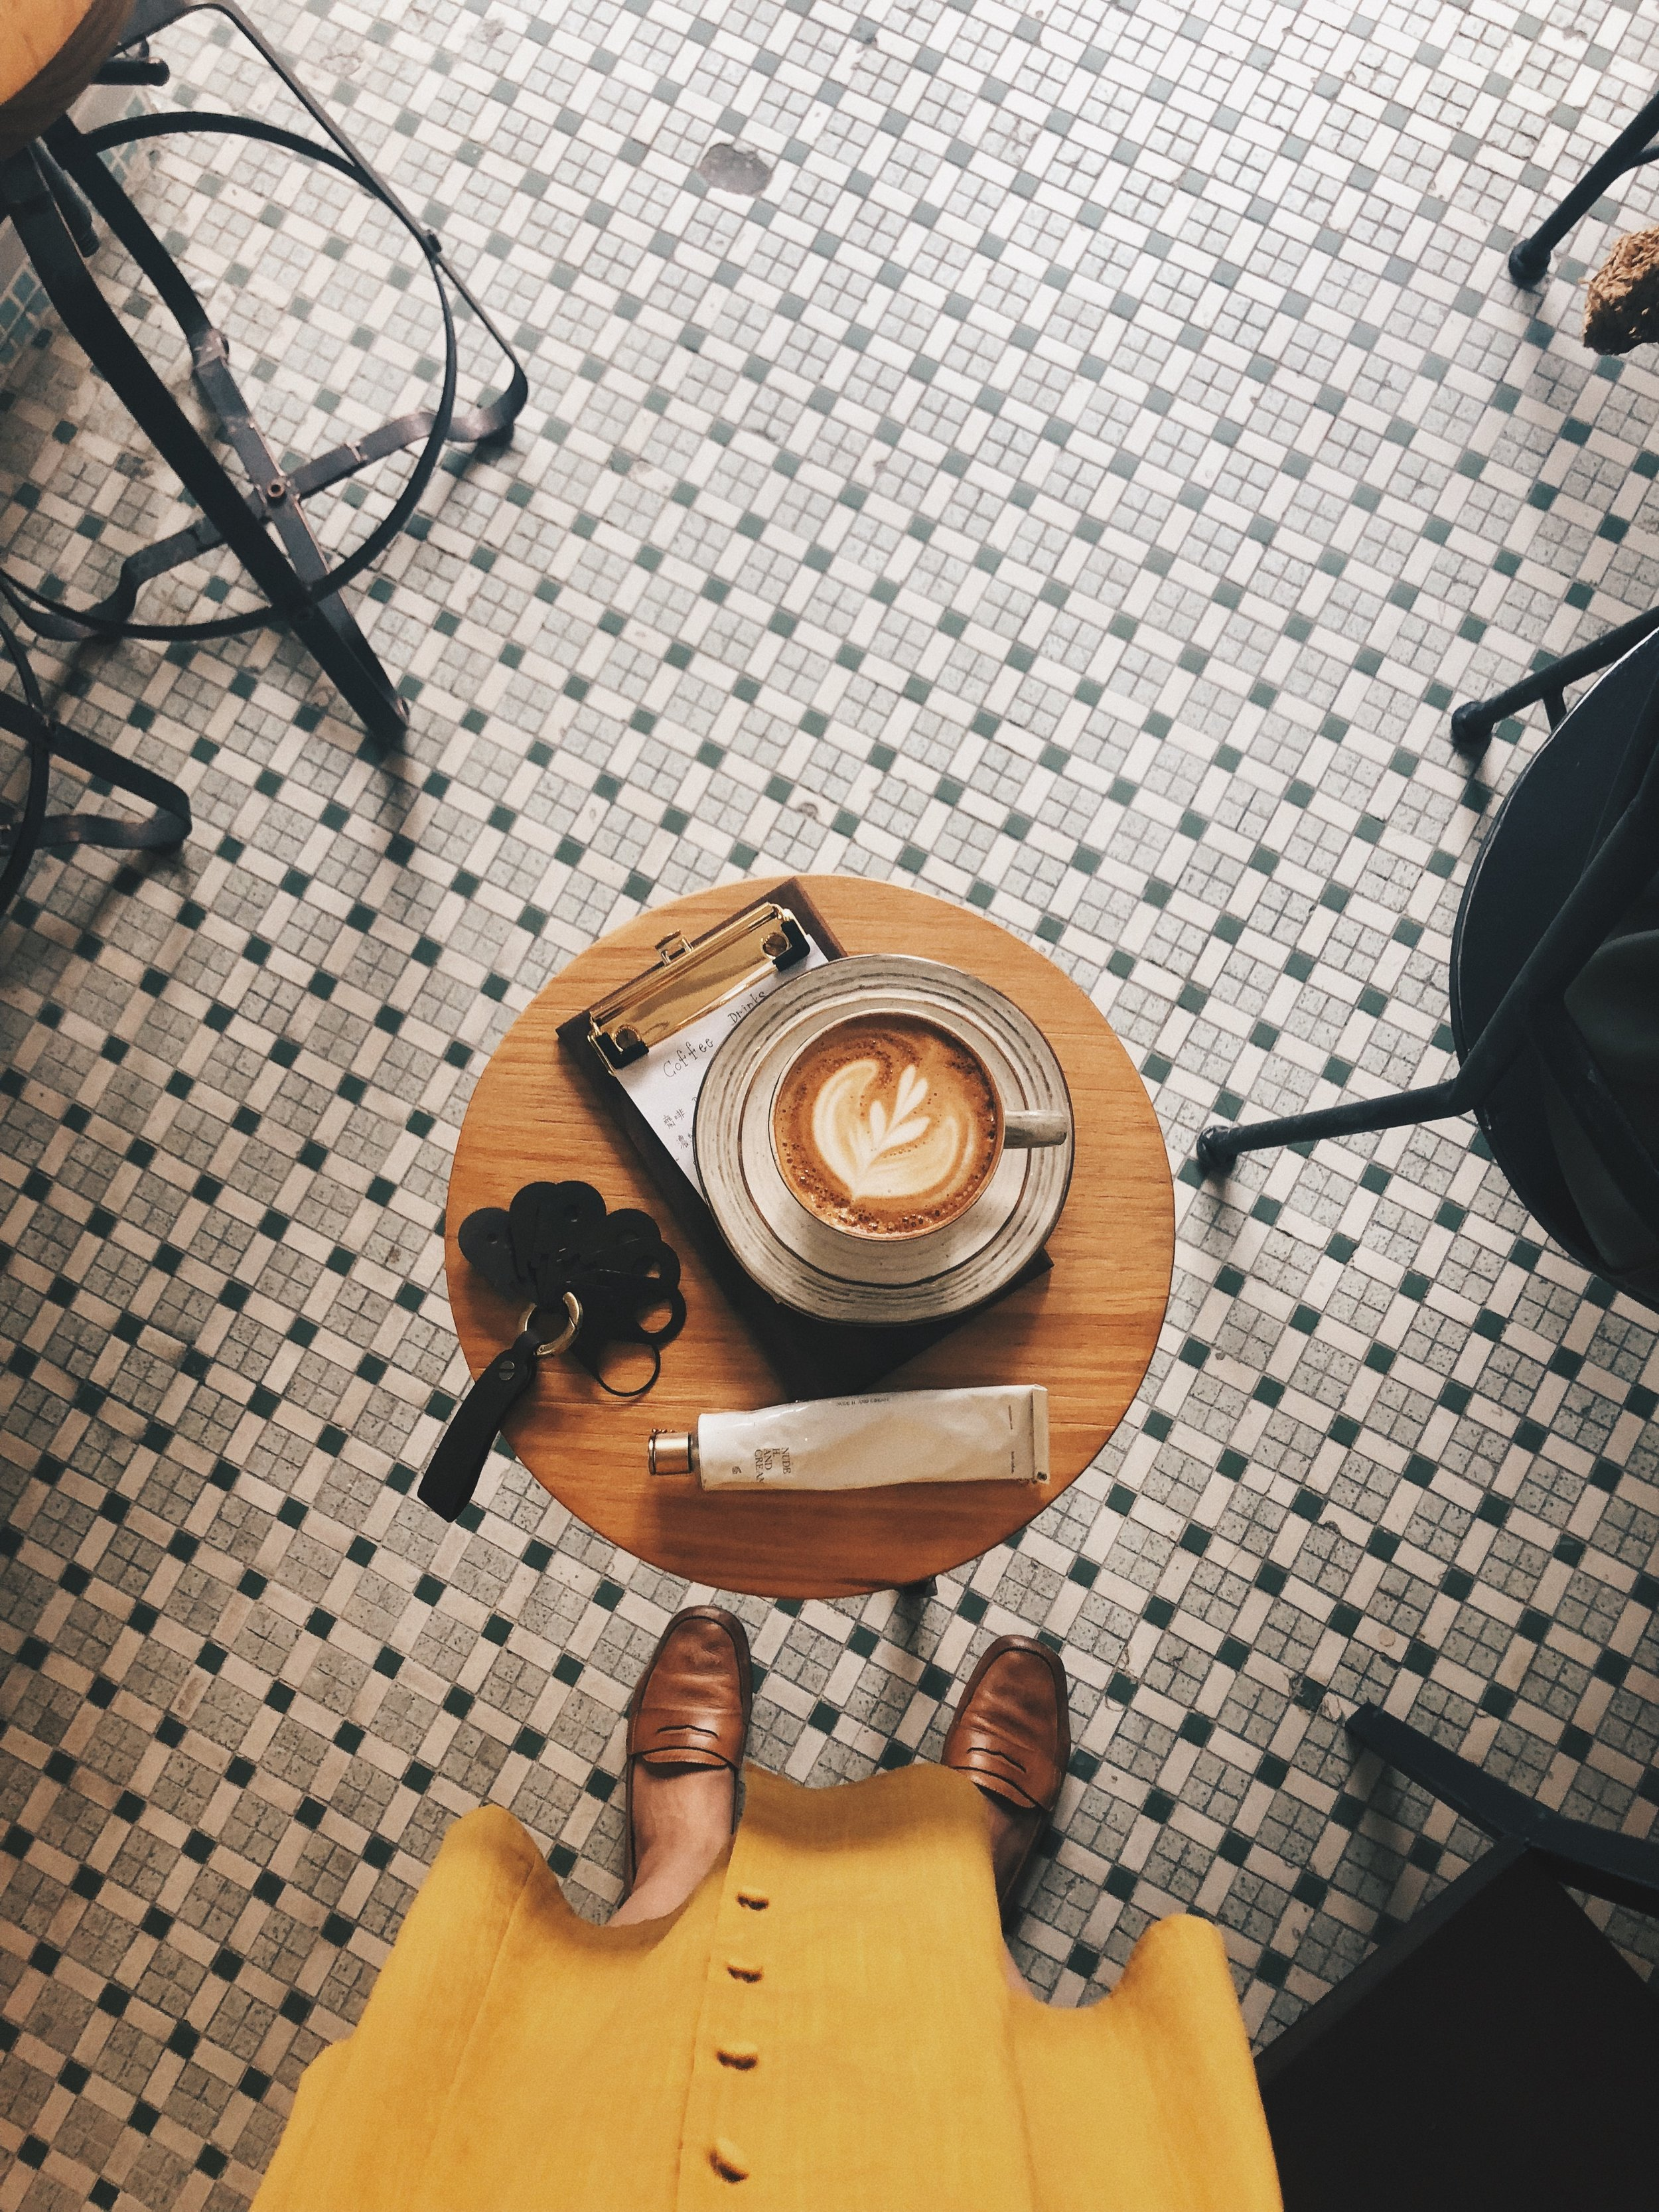 ><>< - COFFEE MATTERS